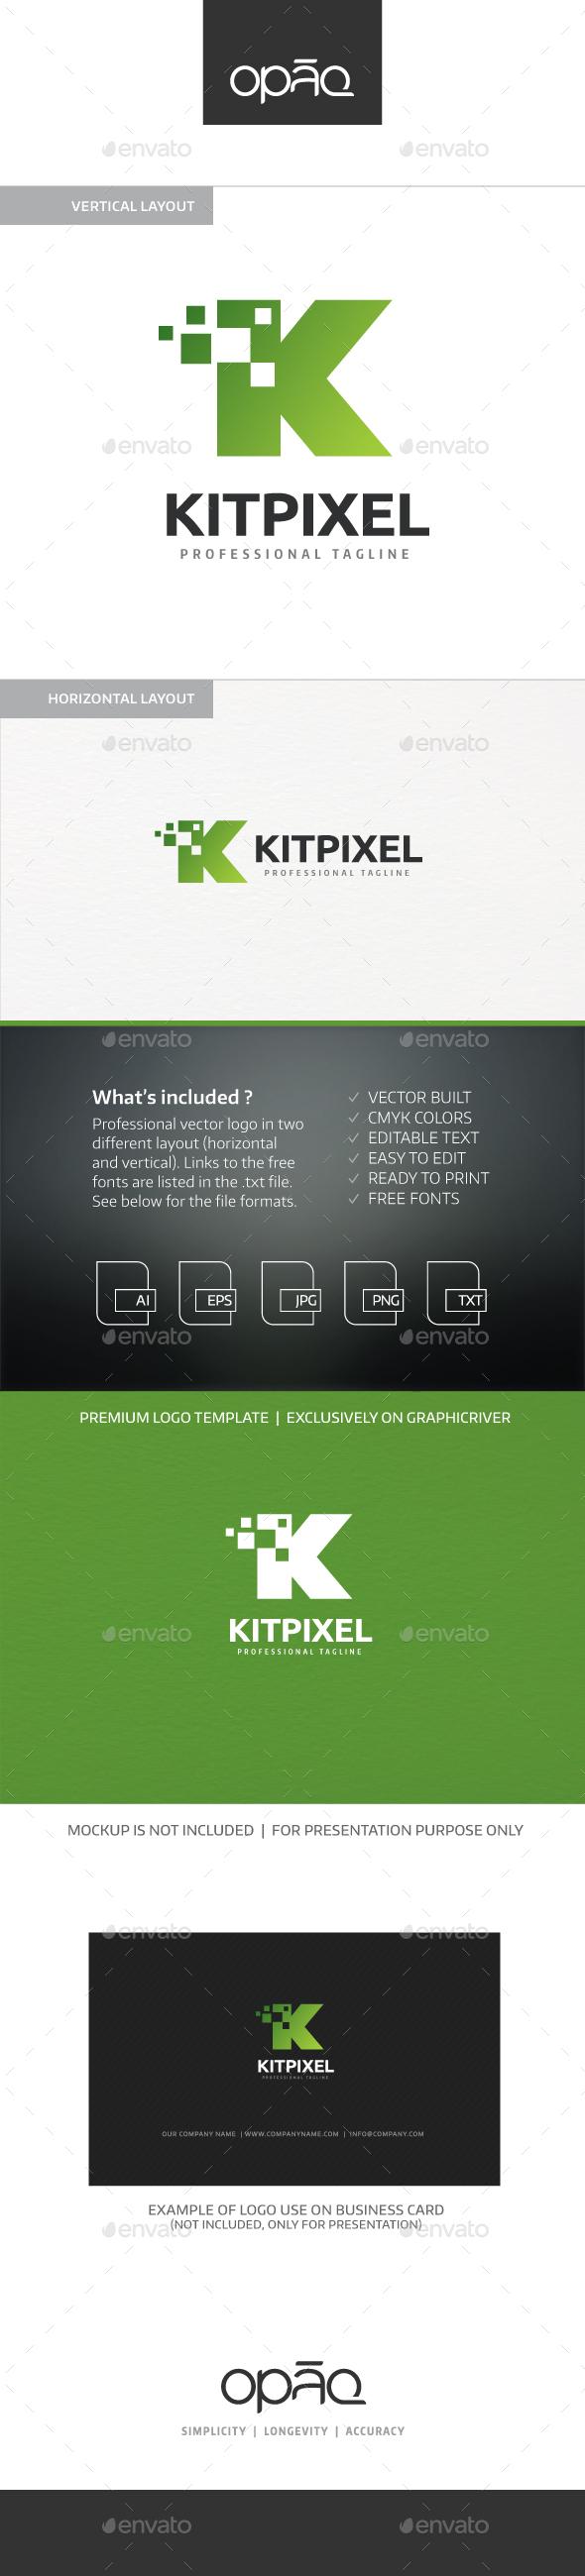 Kit Pixel K Letter Logo - Letters Logo Templates